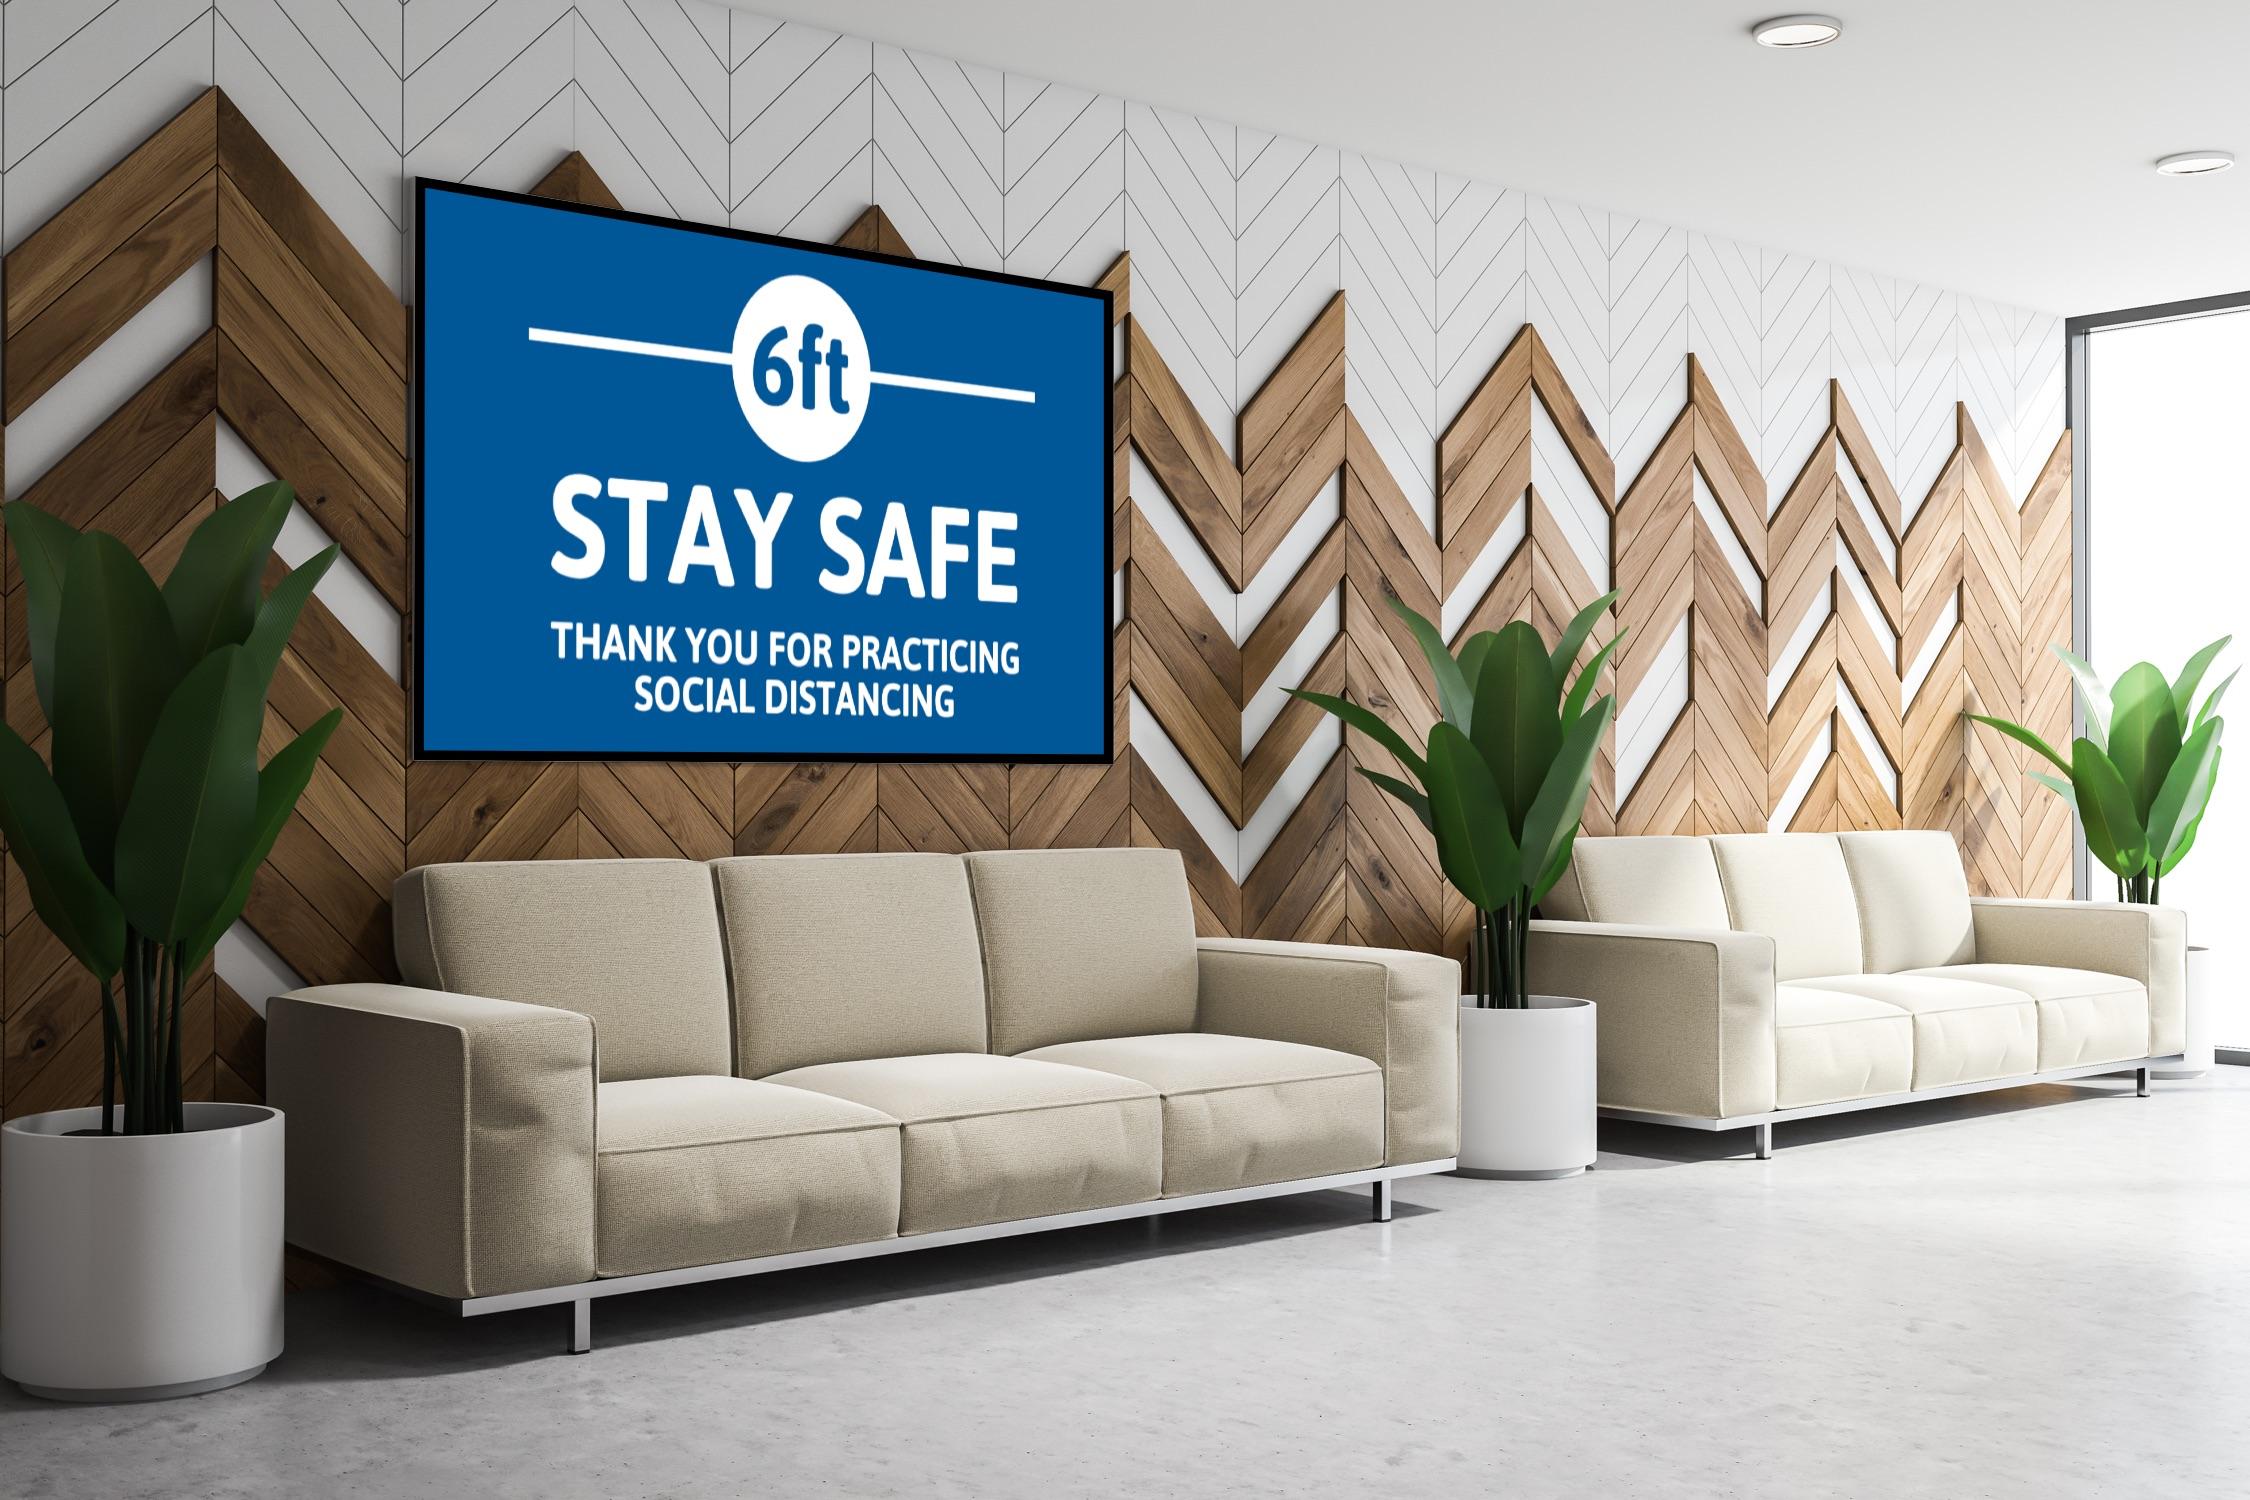 digital-signage-medical-waiting-room